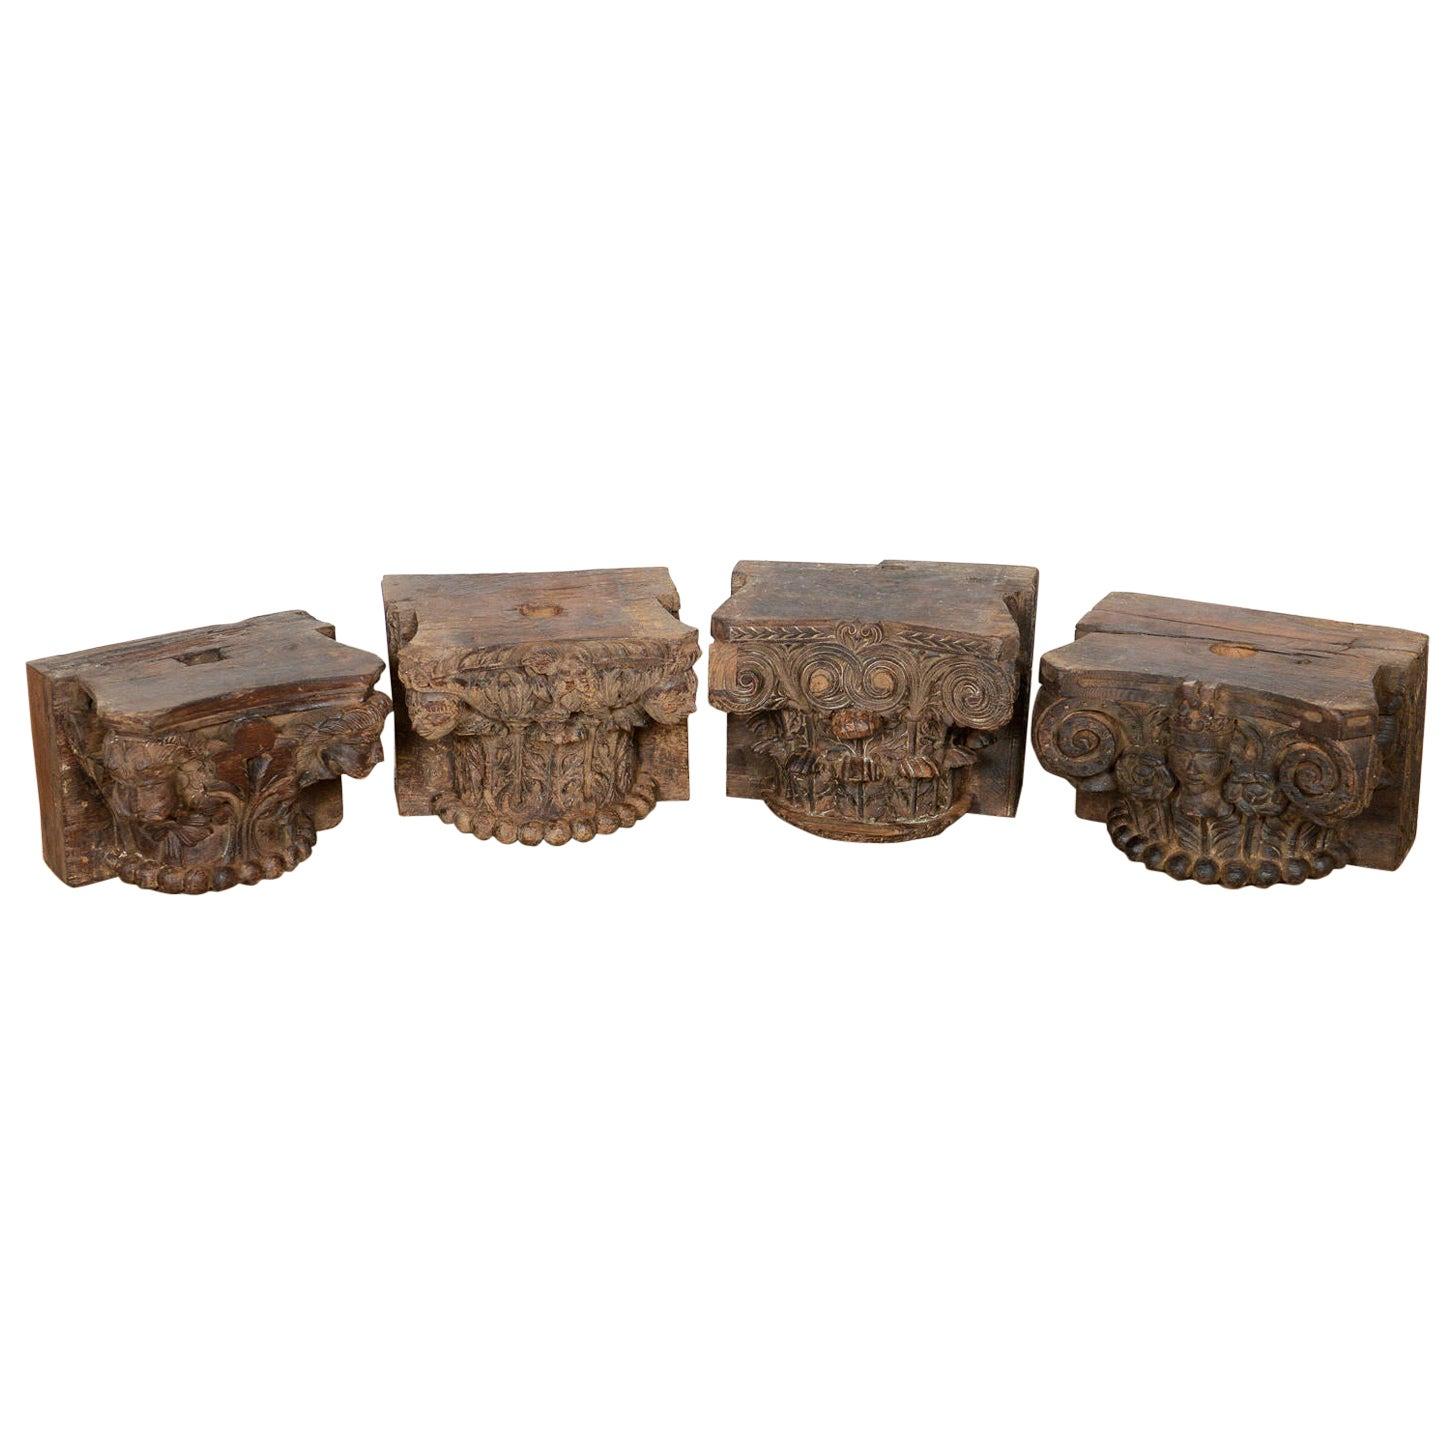 Various Foliate Hardwood Pillar Bases, 20th Century